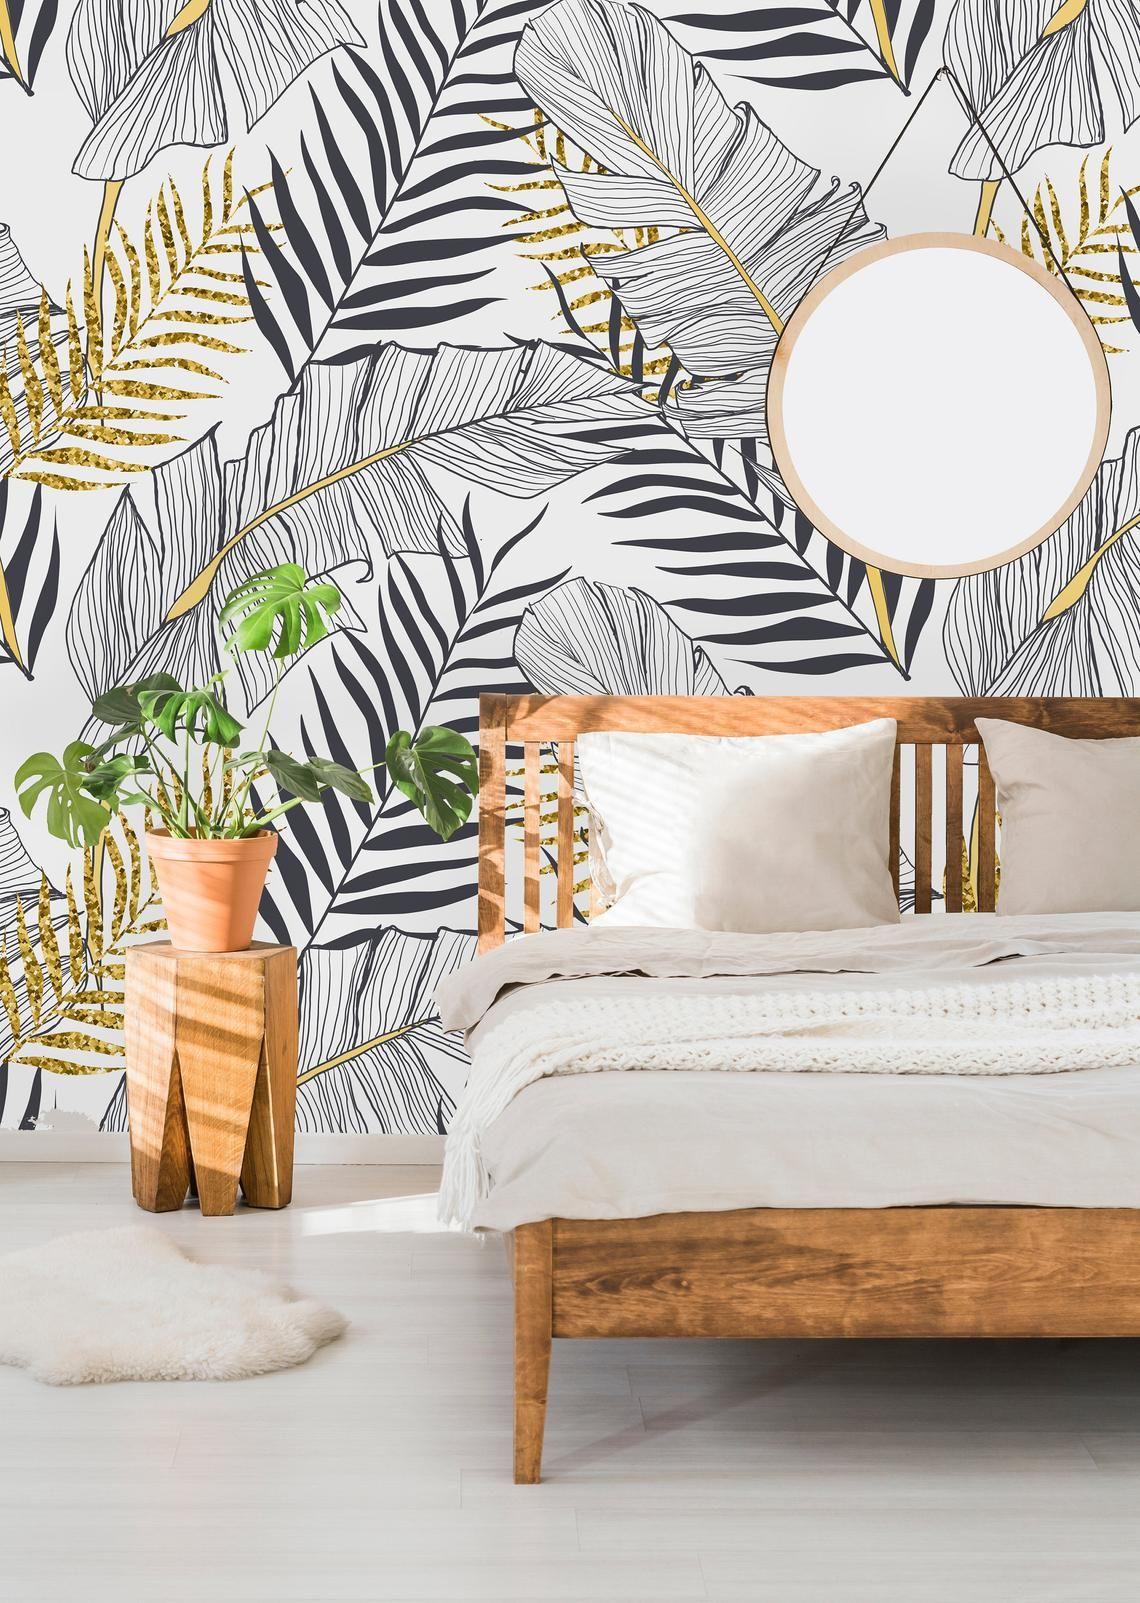 Removable Wallpaper Self Adhesive Wallpaper Tropical Gold Etsy Wallpaper Living Room Leaf Wallpaper Home Decor